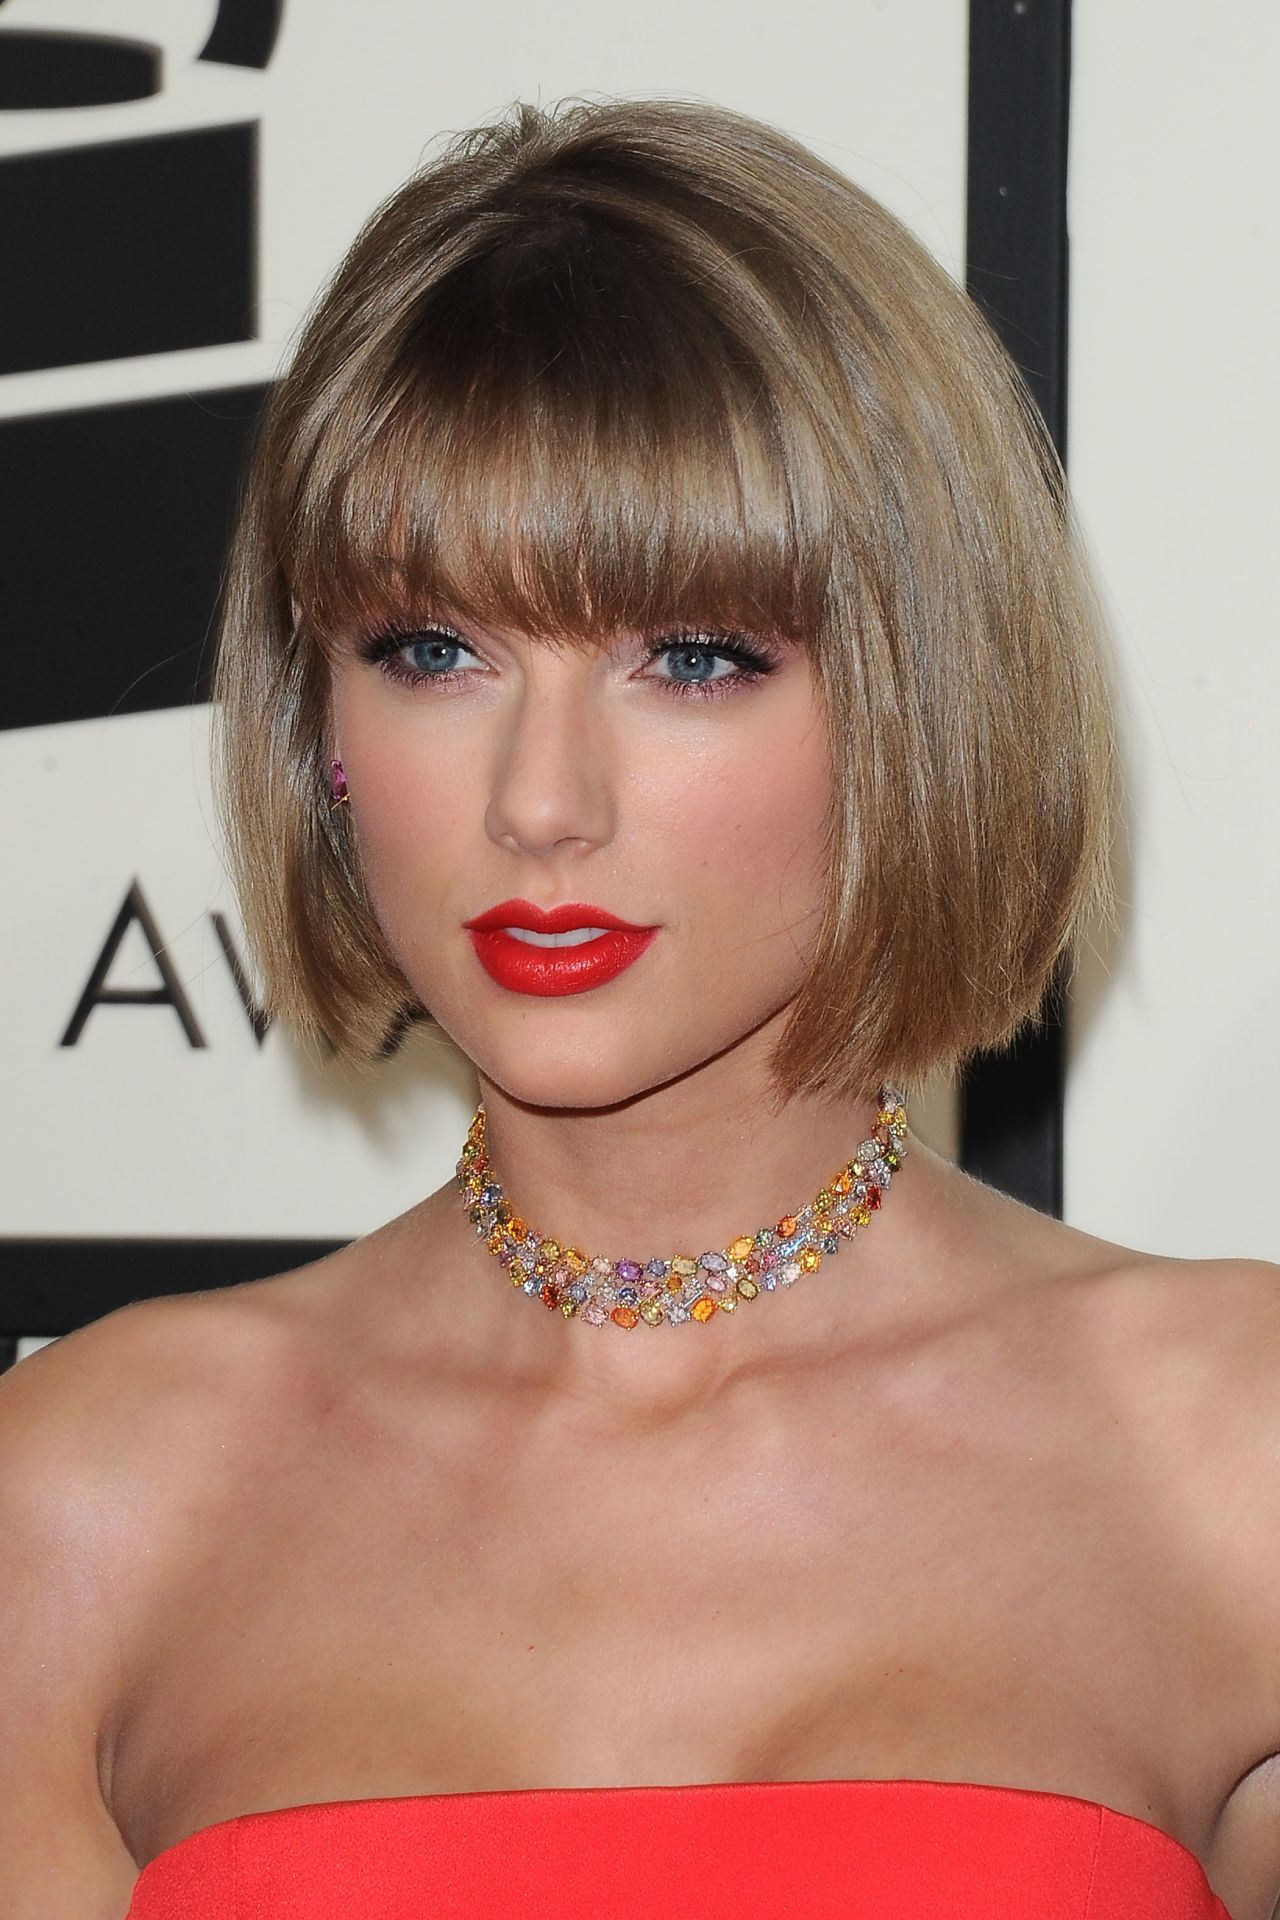 Taylor Swift - 2016 Grammy Awards in Los Angeles, CA Taylor Swift